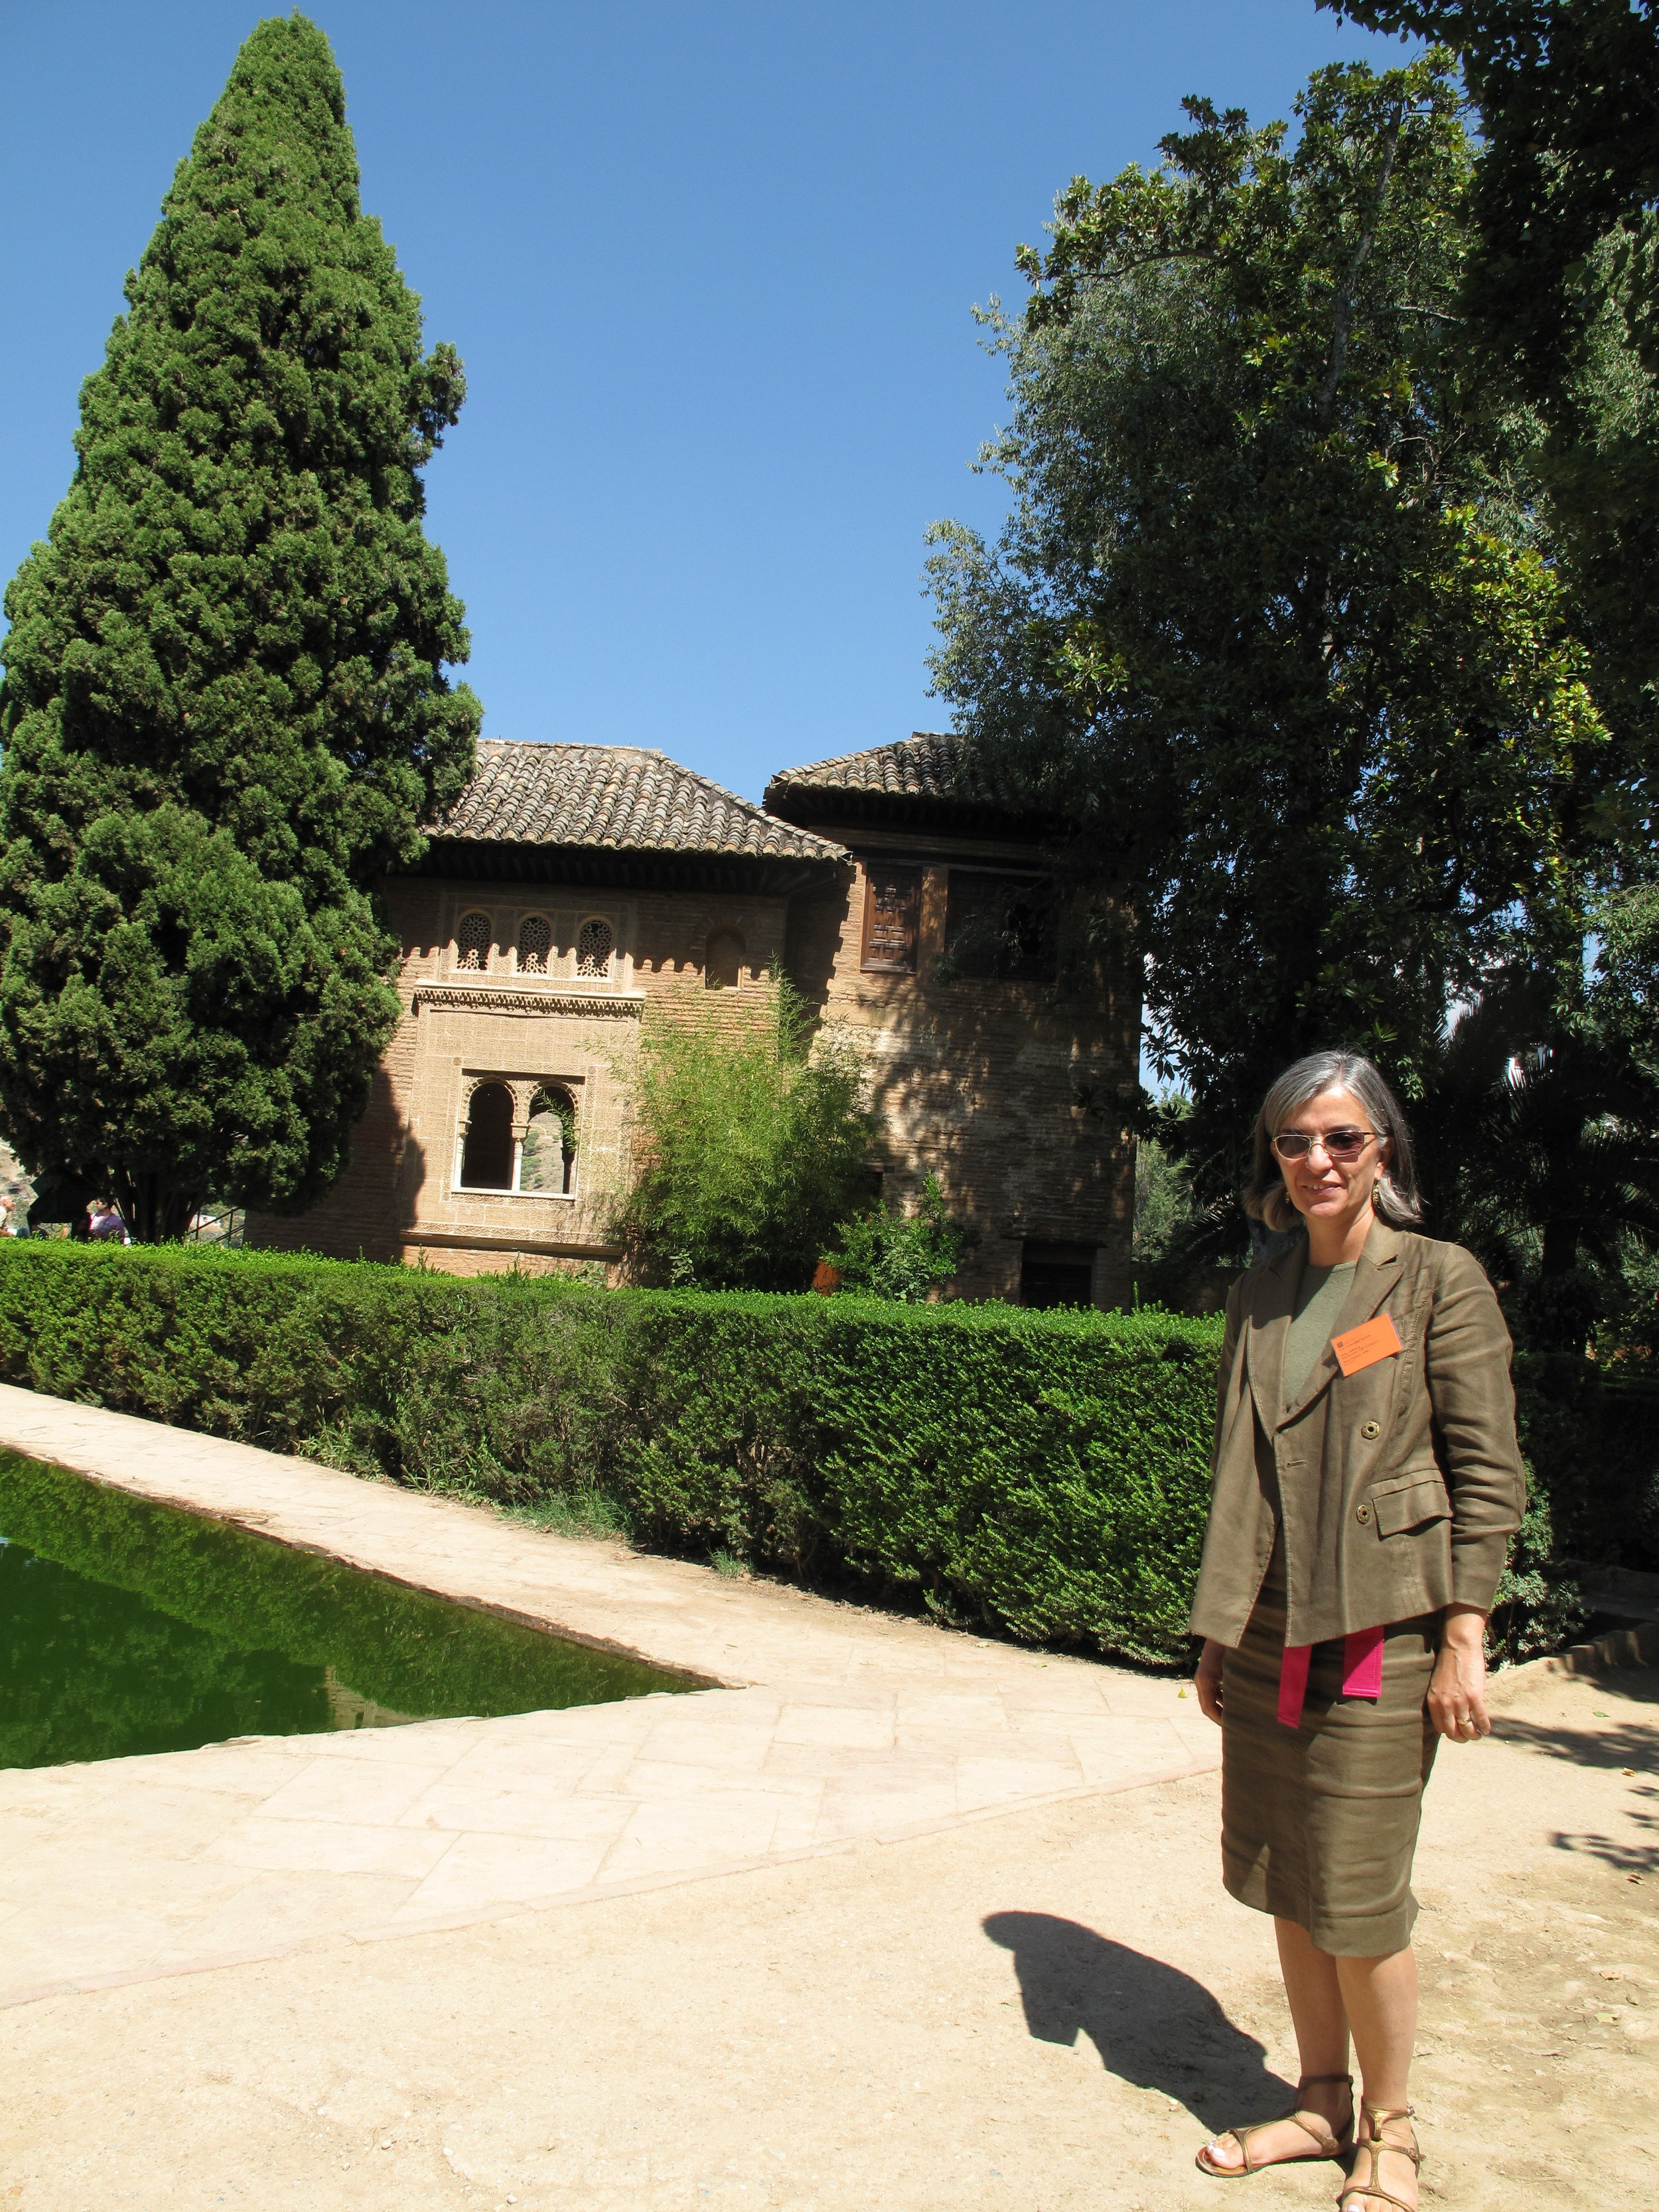 Oratorio del Partal - Alhambra, Spain